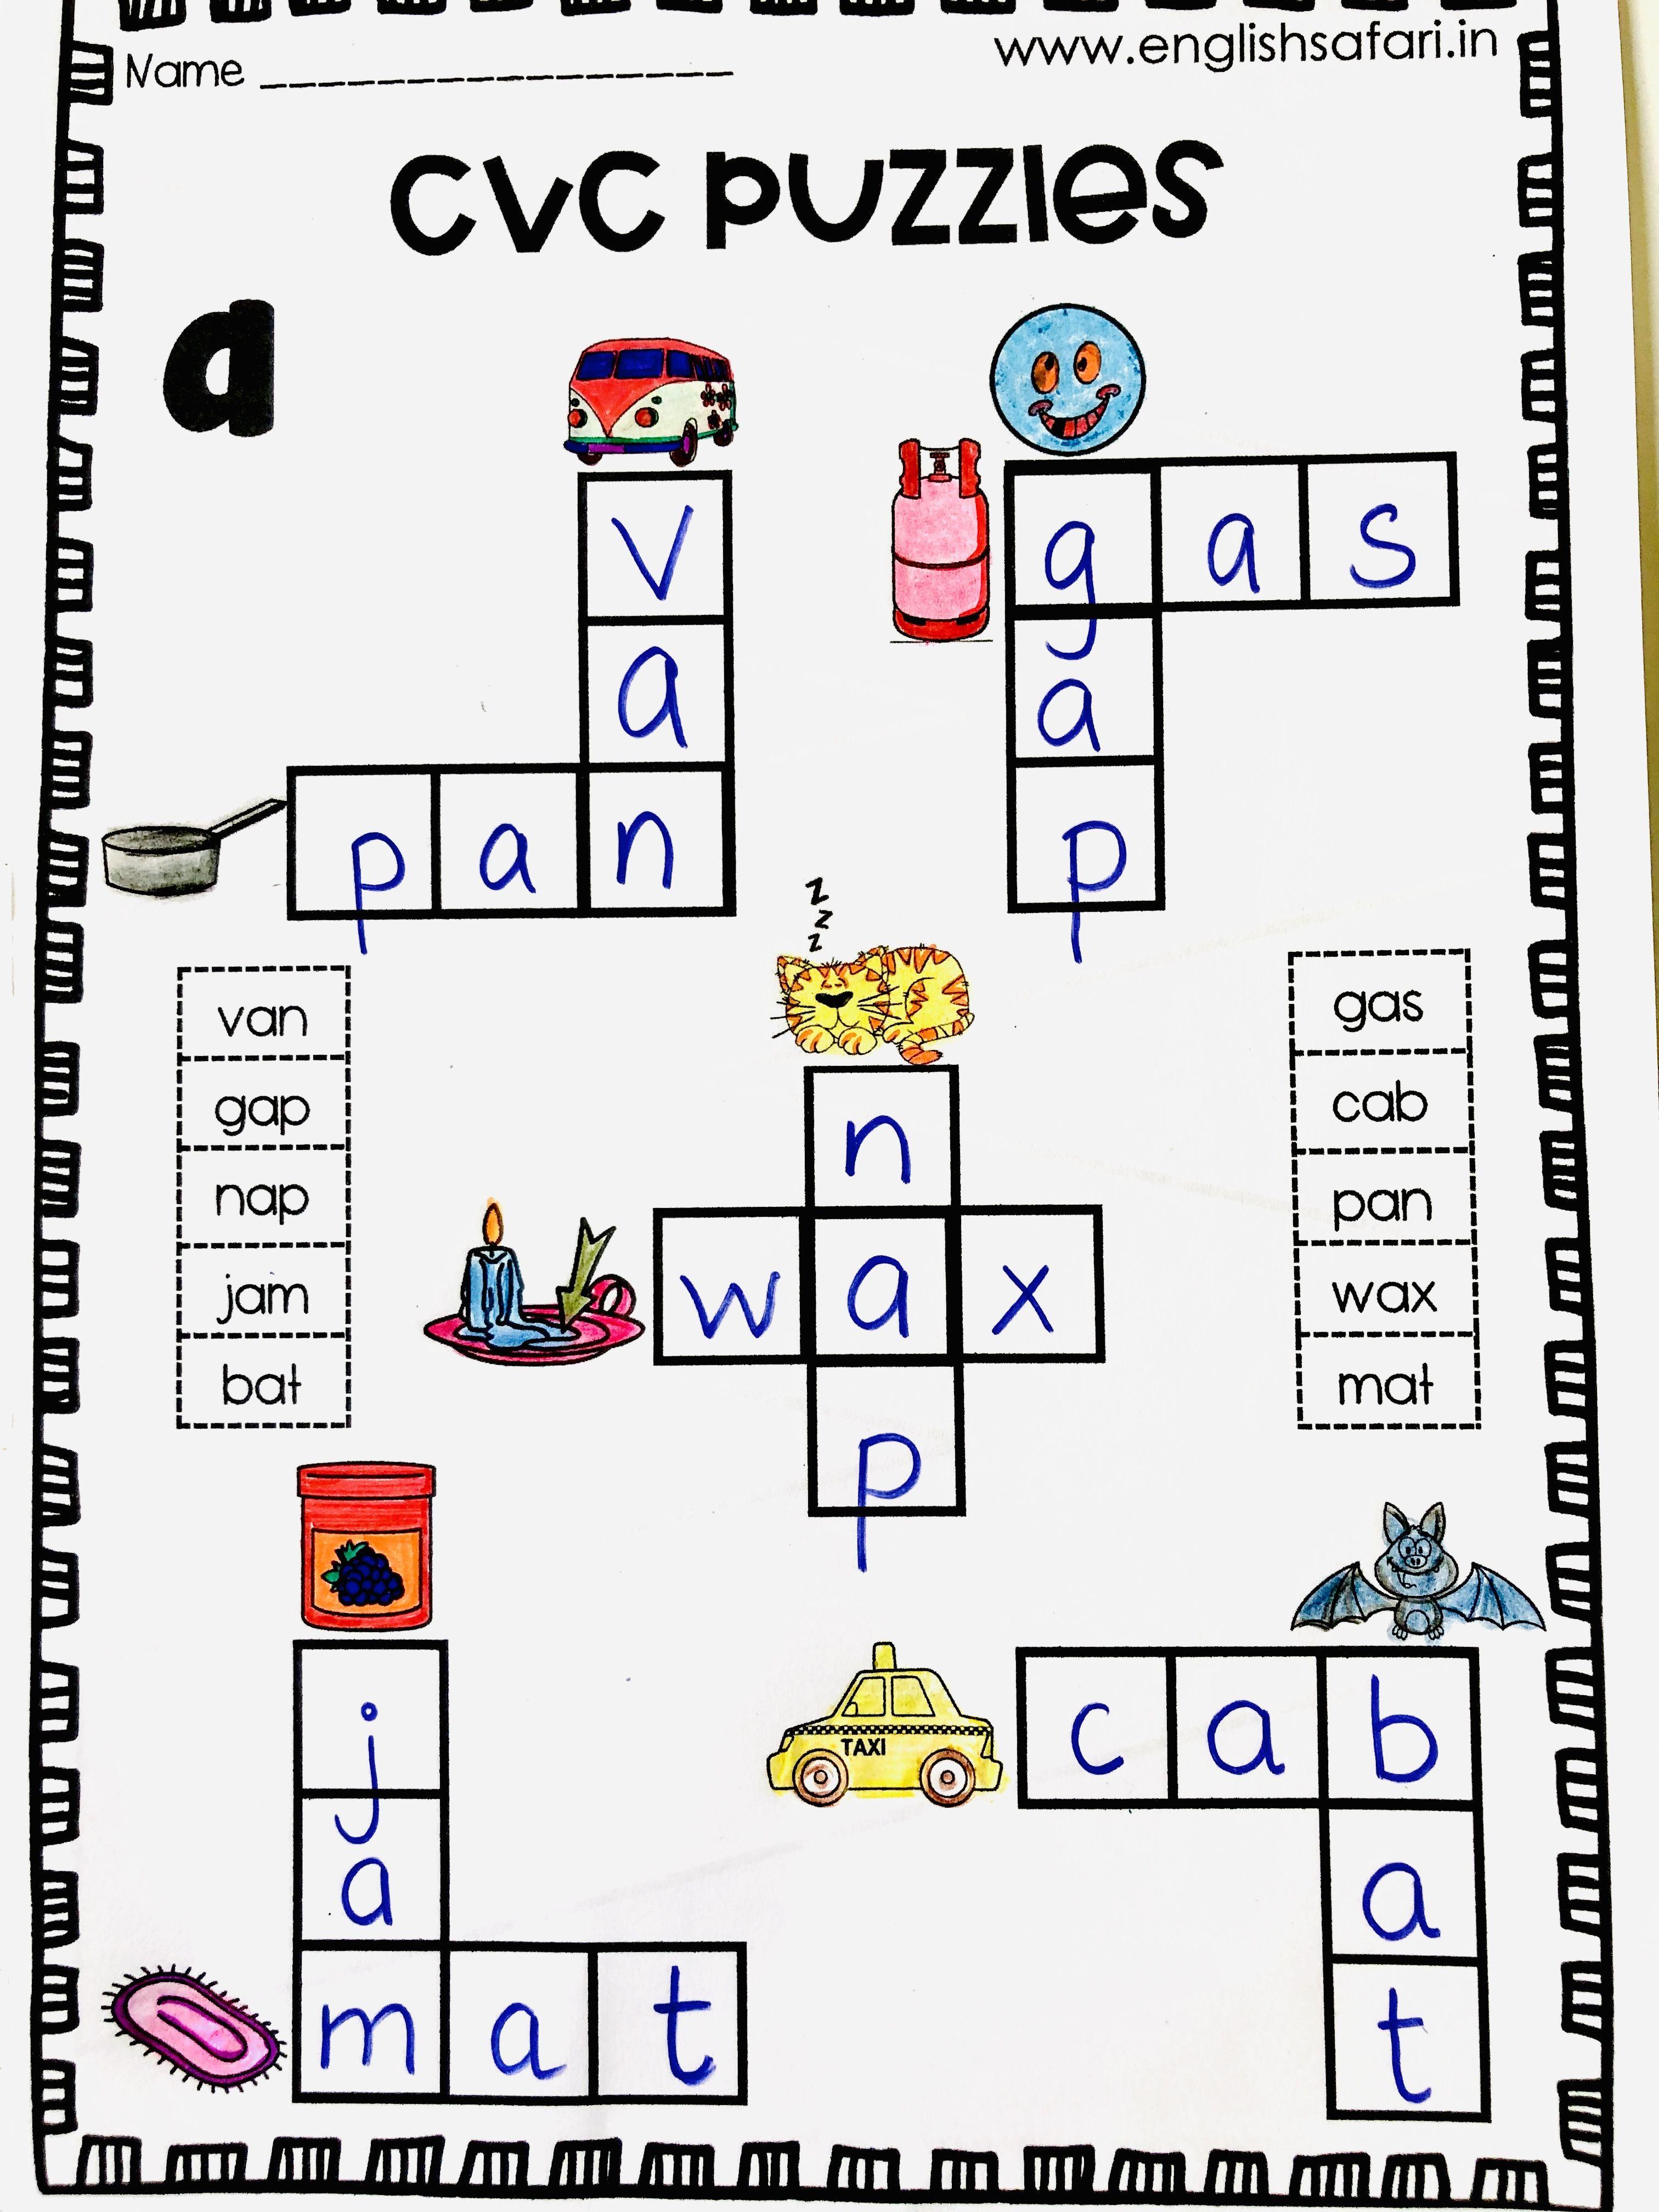 Free Cvc Words A Puzzles Www Englishsafari In In 2020 Cvc Words Three Letter Words Cvc